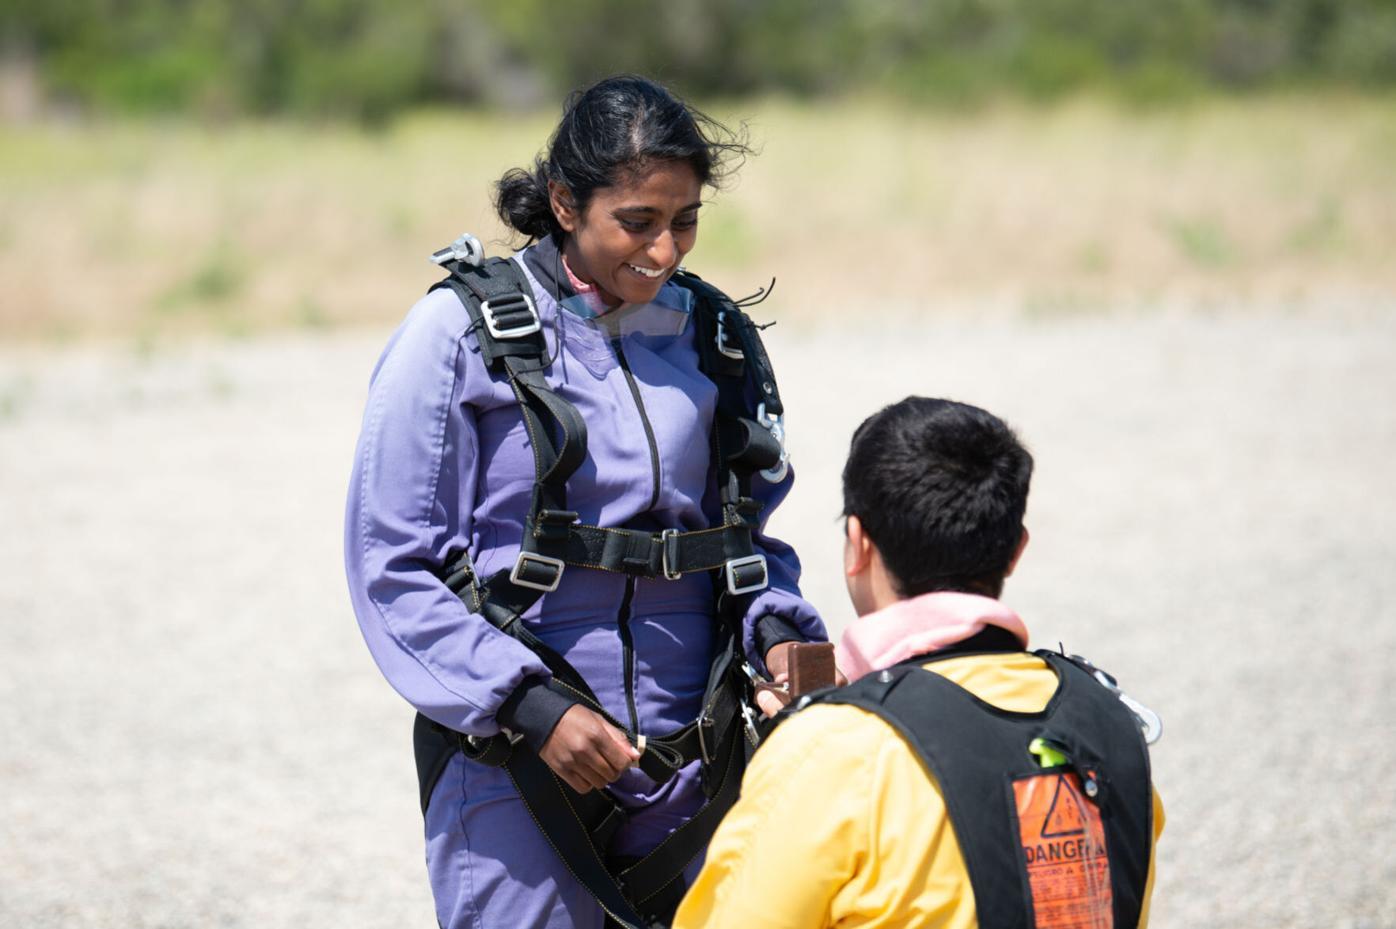 071921 Skydiving proposal 2